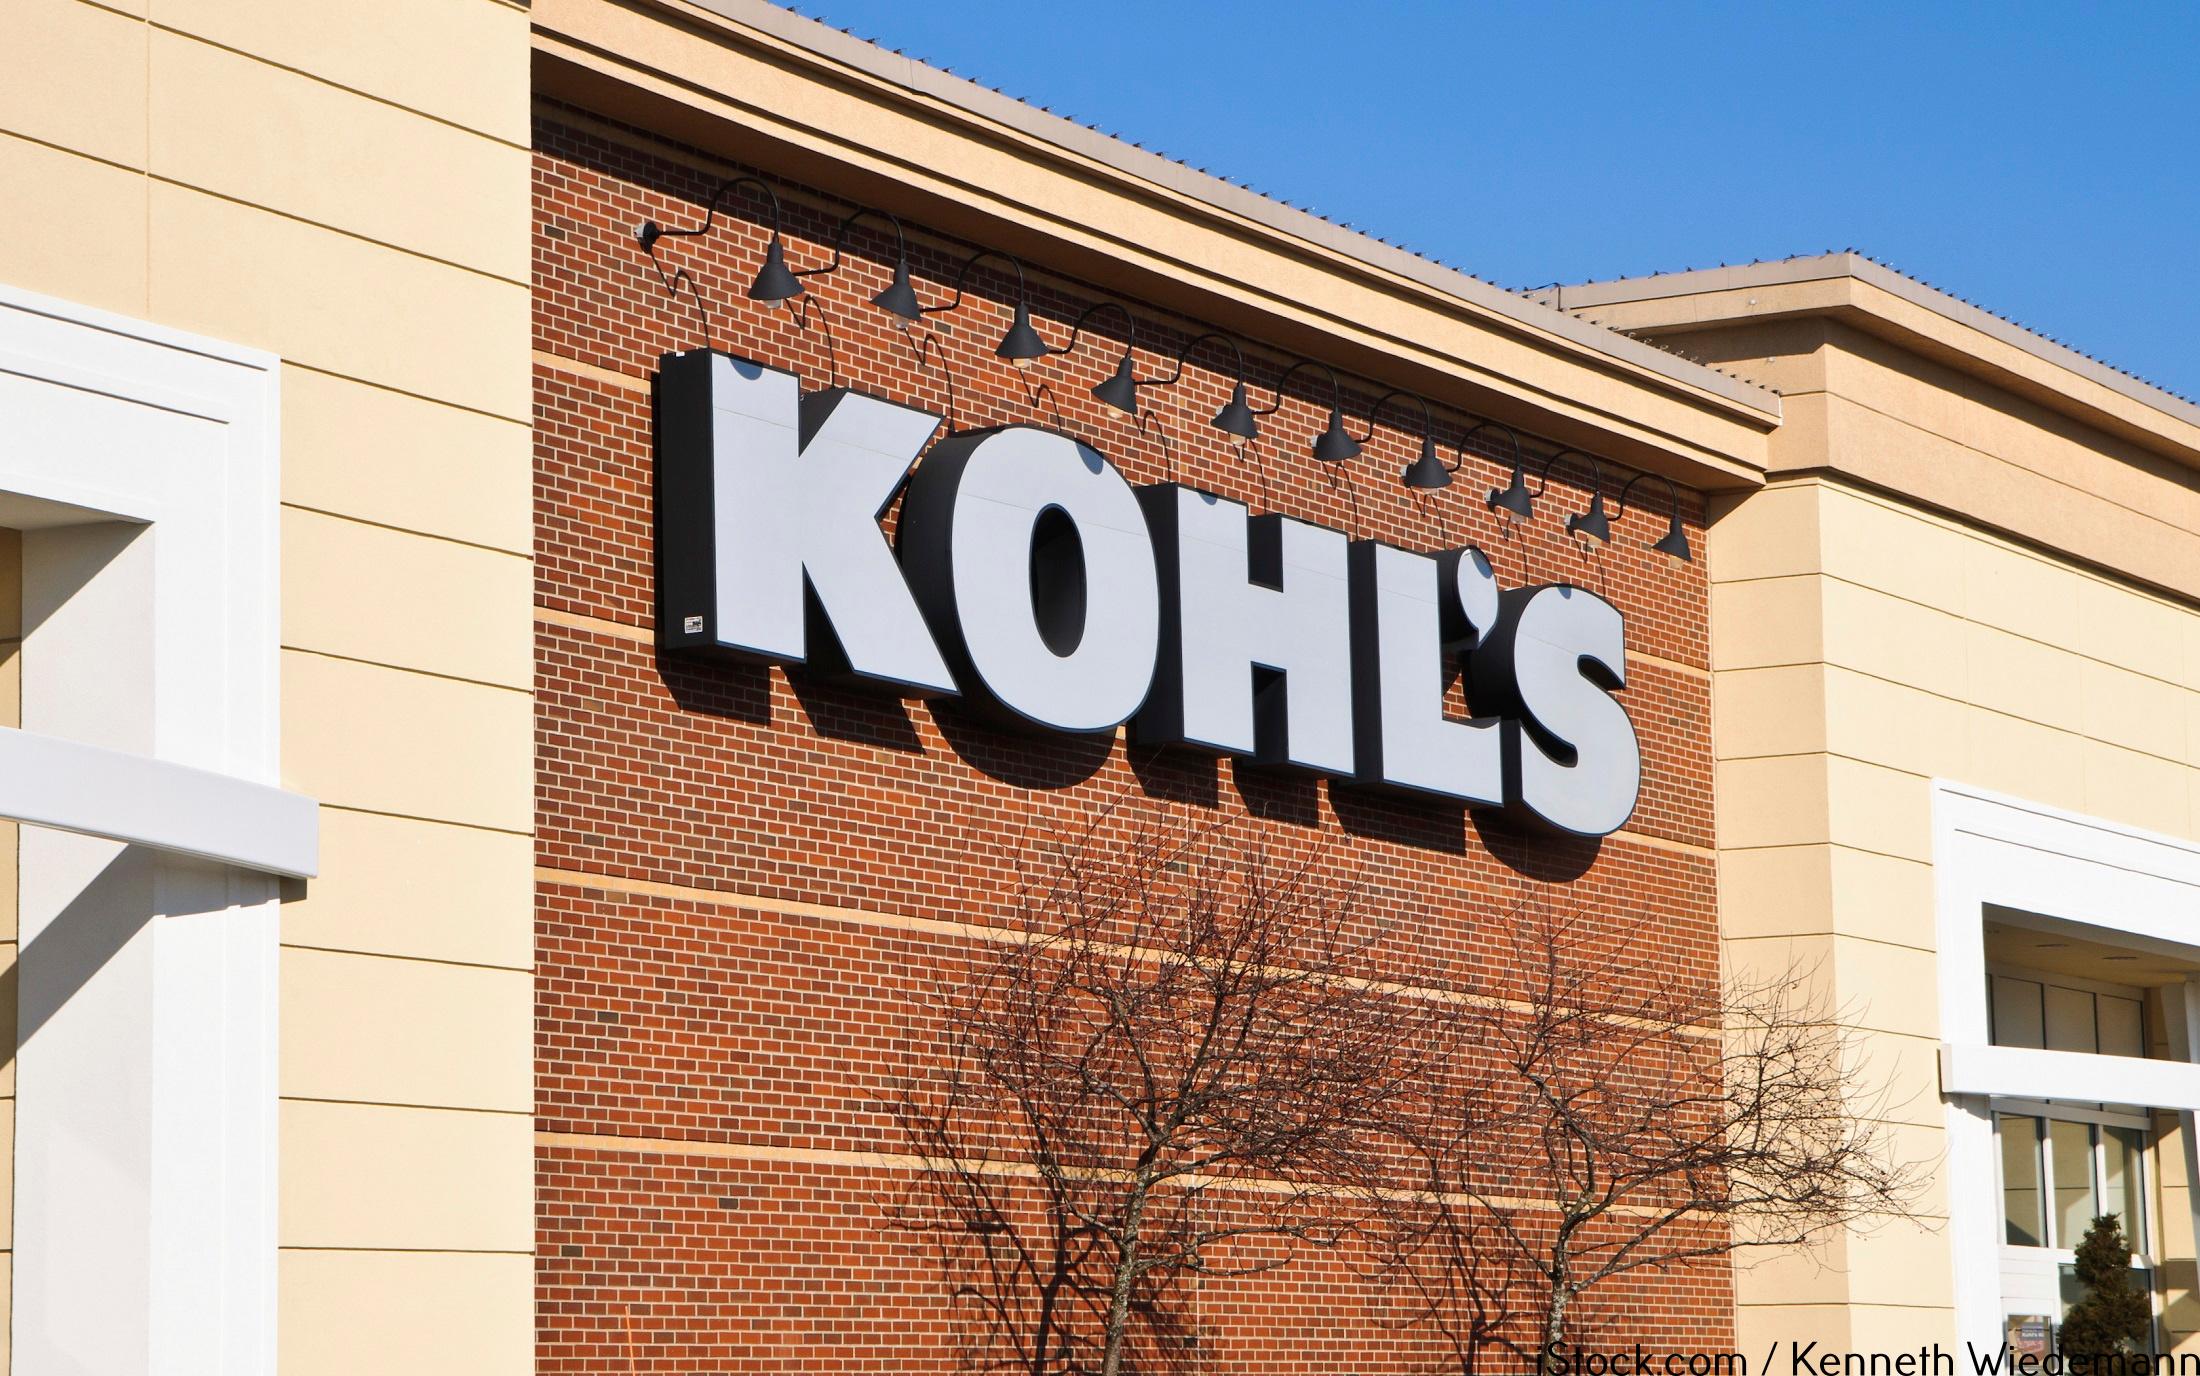 Kohl_s_Return_Policy1.jpg